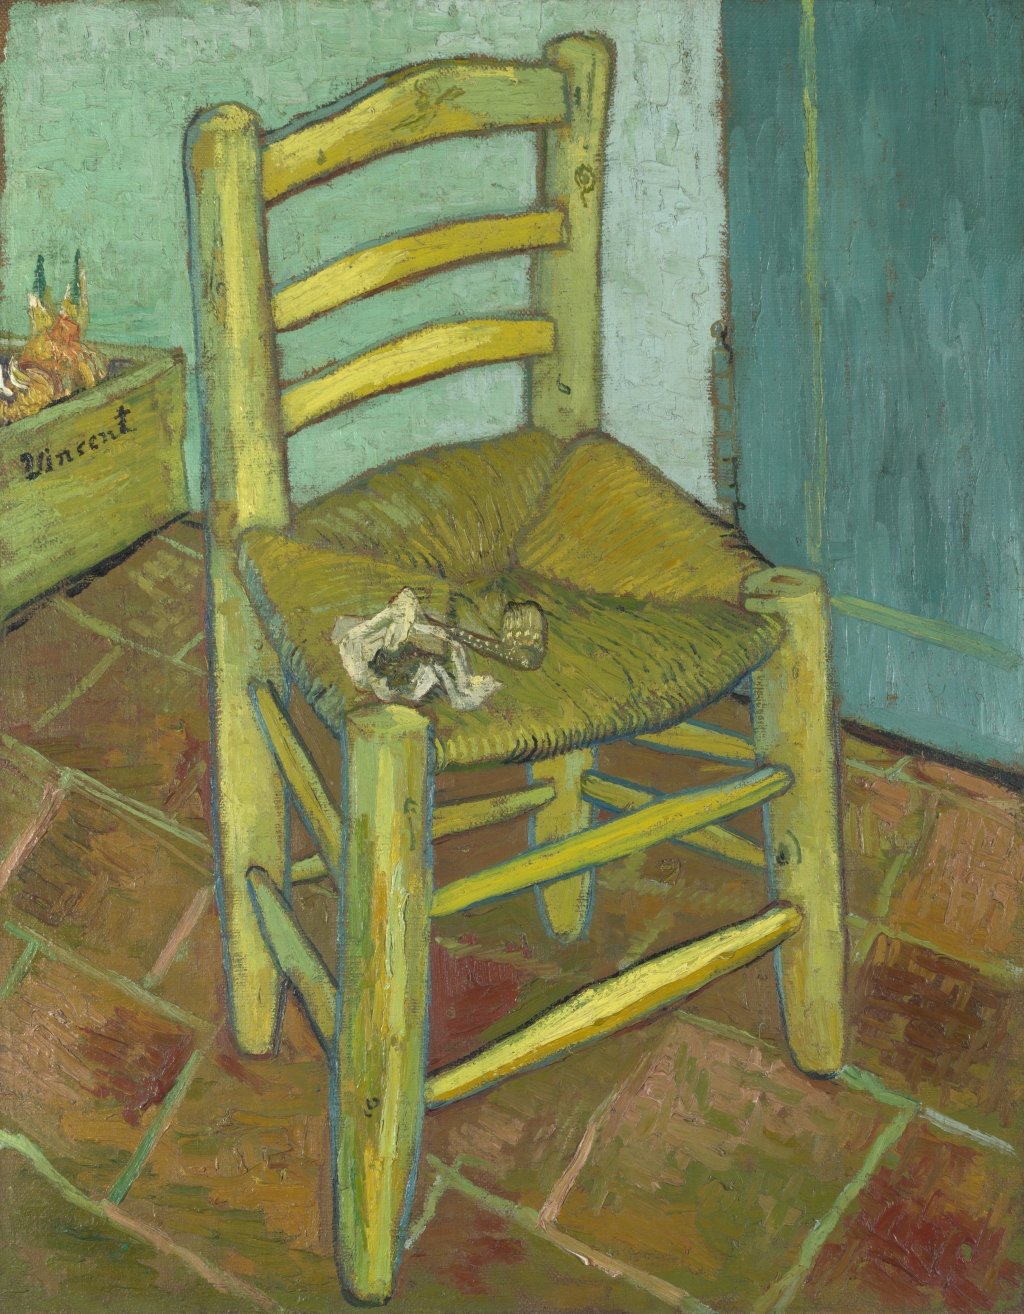 Van Gogh's Chair (1888)